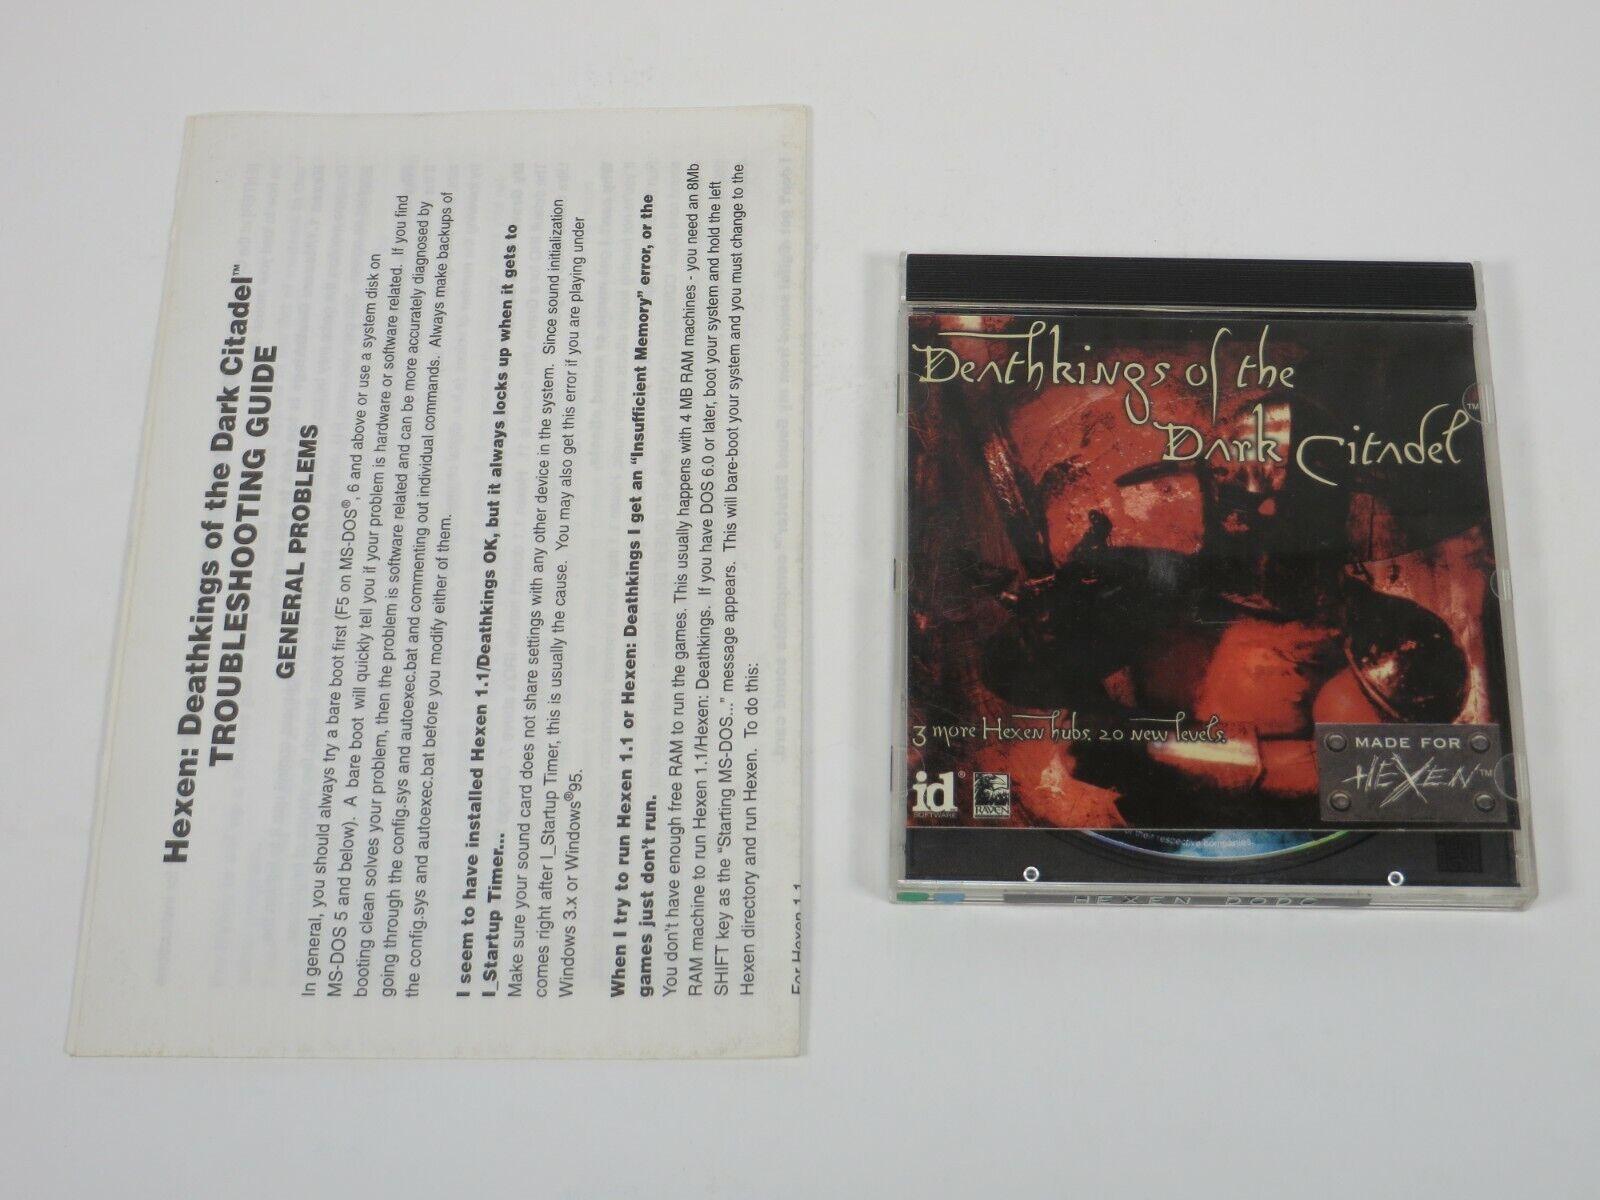 Computer Games - Hexen: Deathkings of the Dark Citadel (PC, 1996) PC Vintage Computer Game